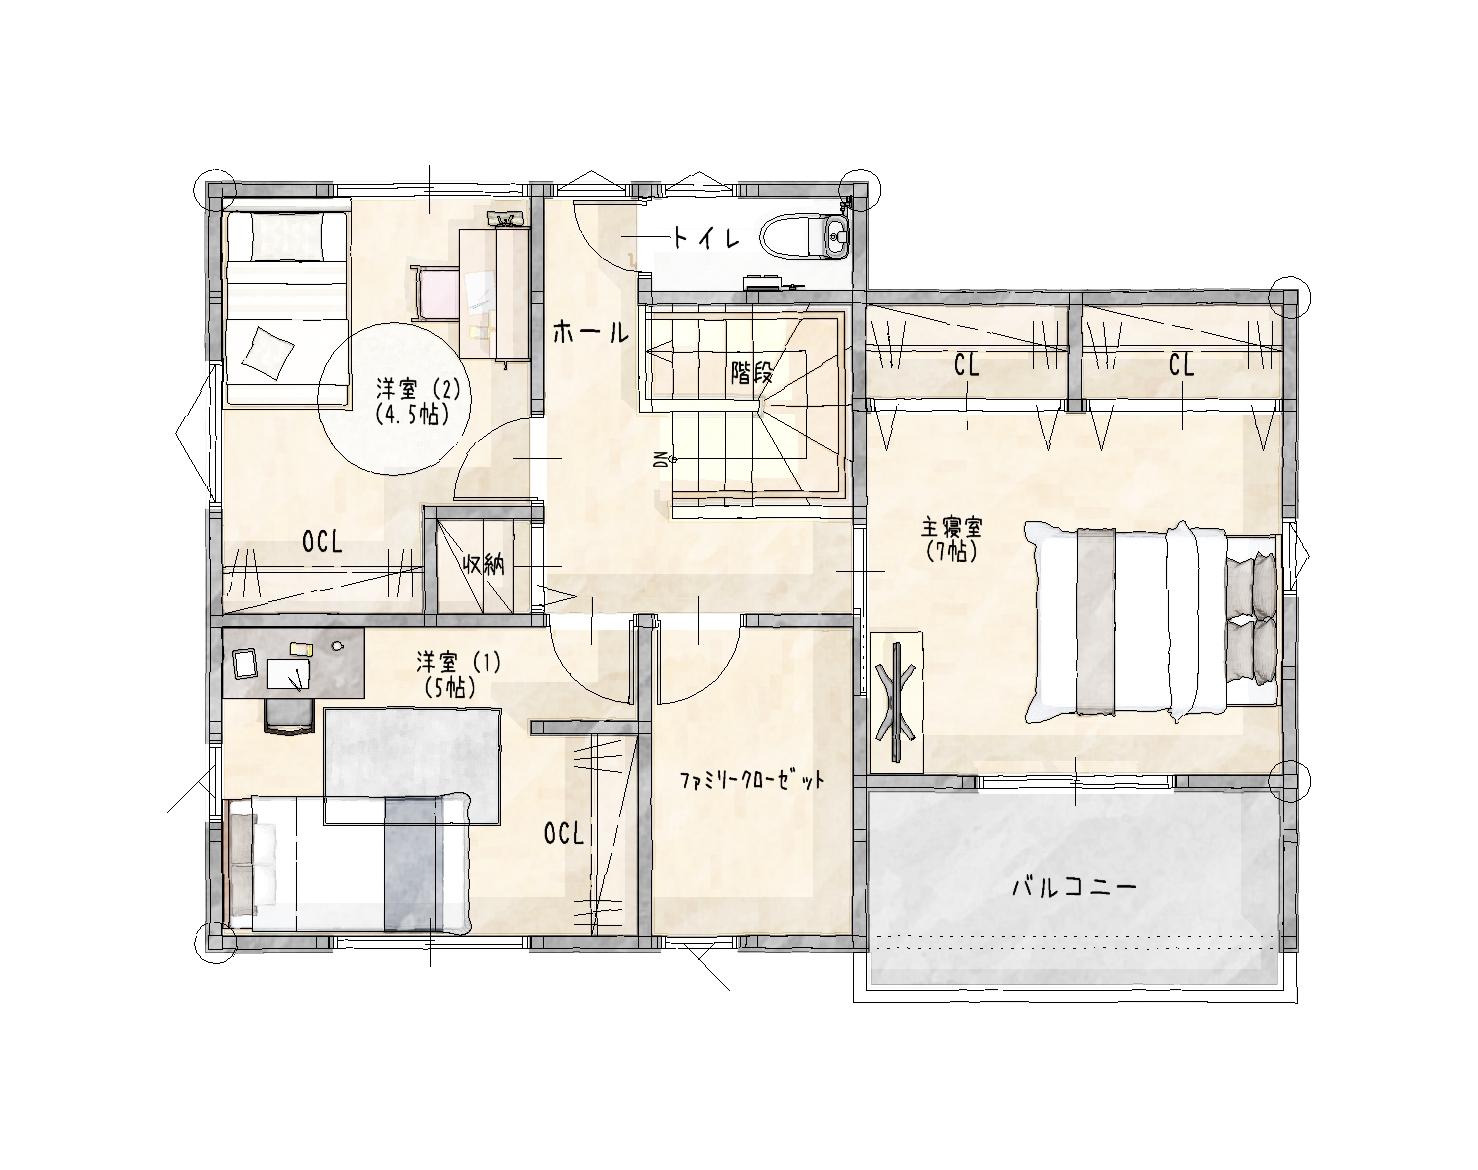 大村市新築建売住宅「OURS宮小路」2階間取り図